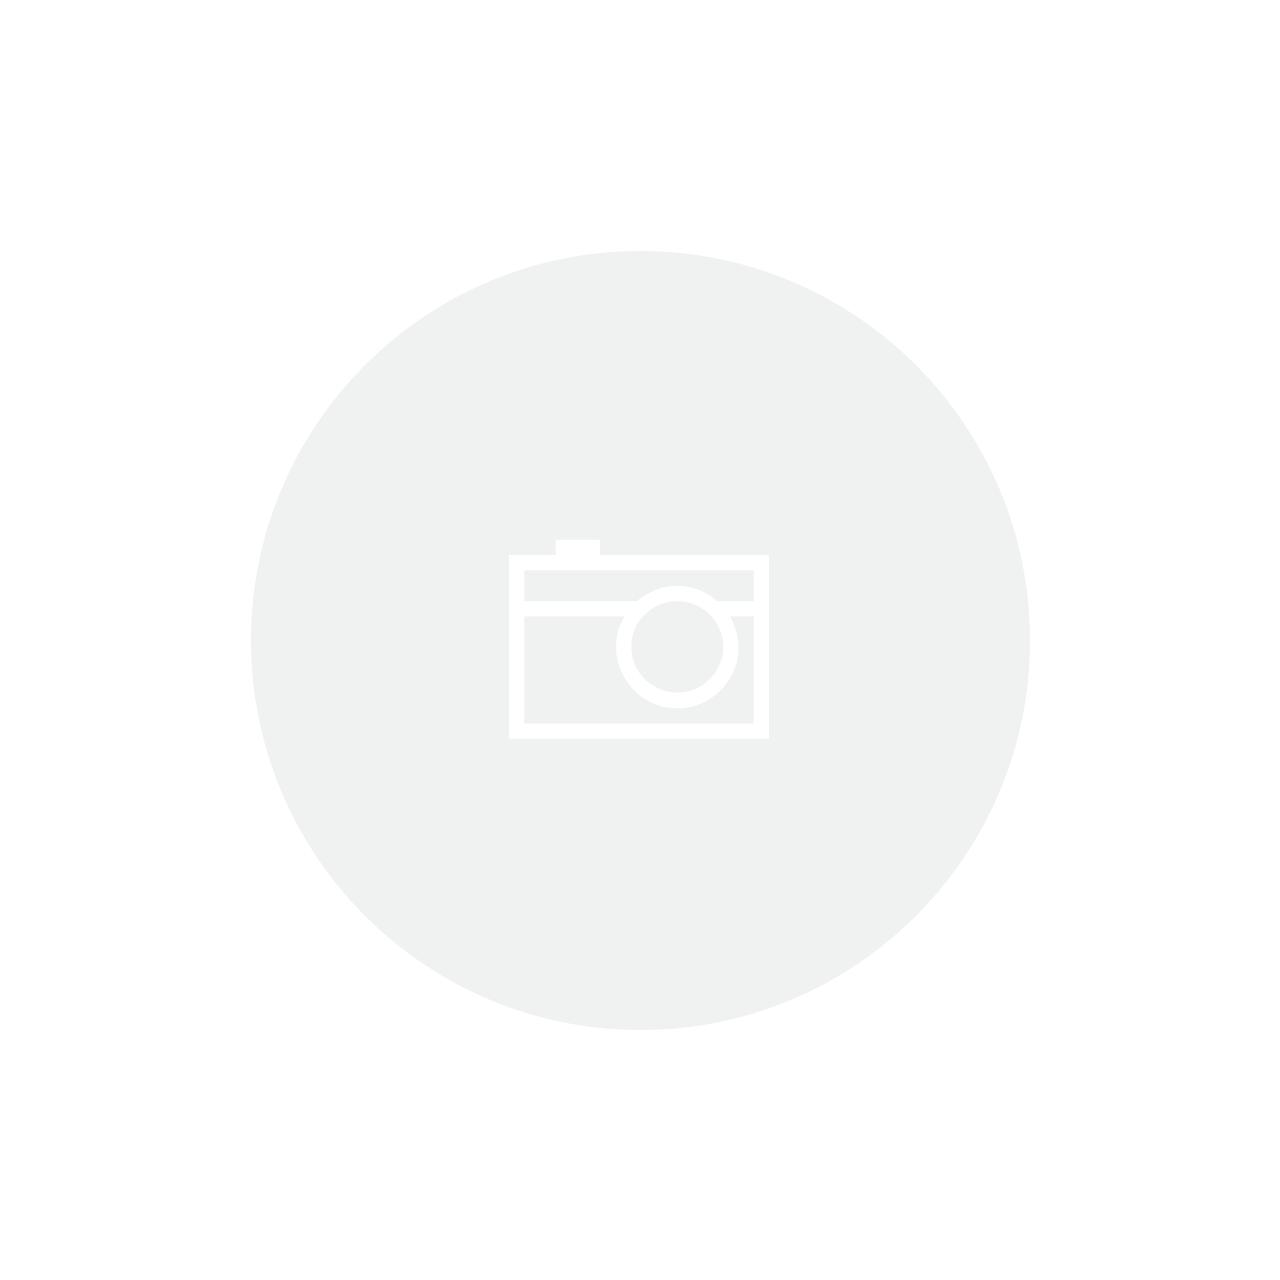 Lâmina de Tosa 50 - Oster Cirúrgica